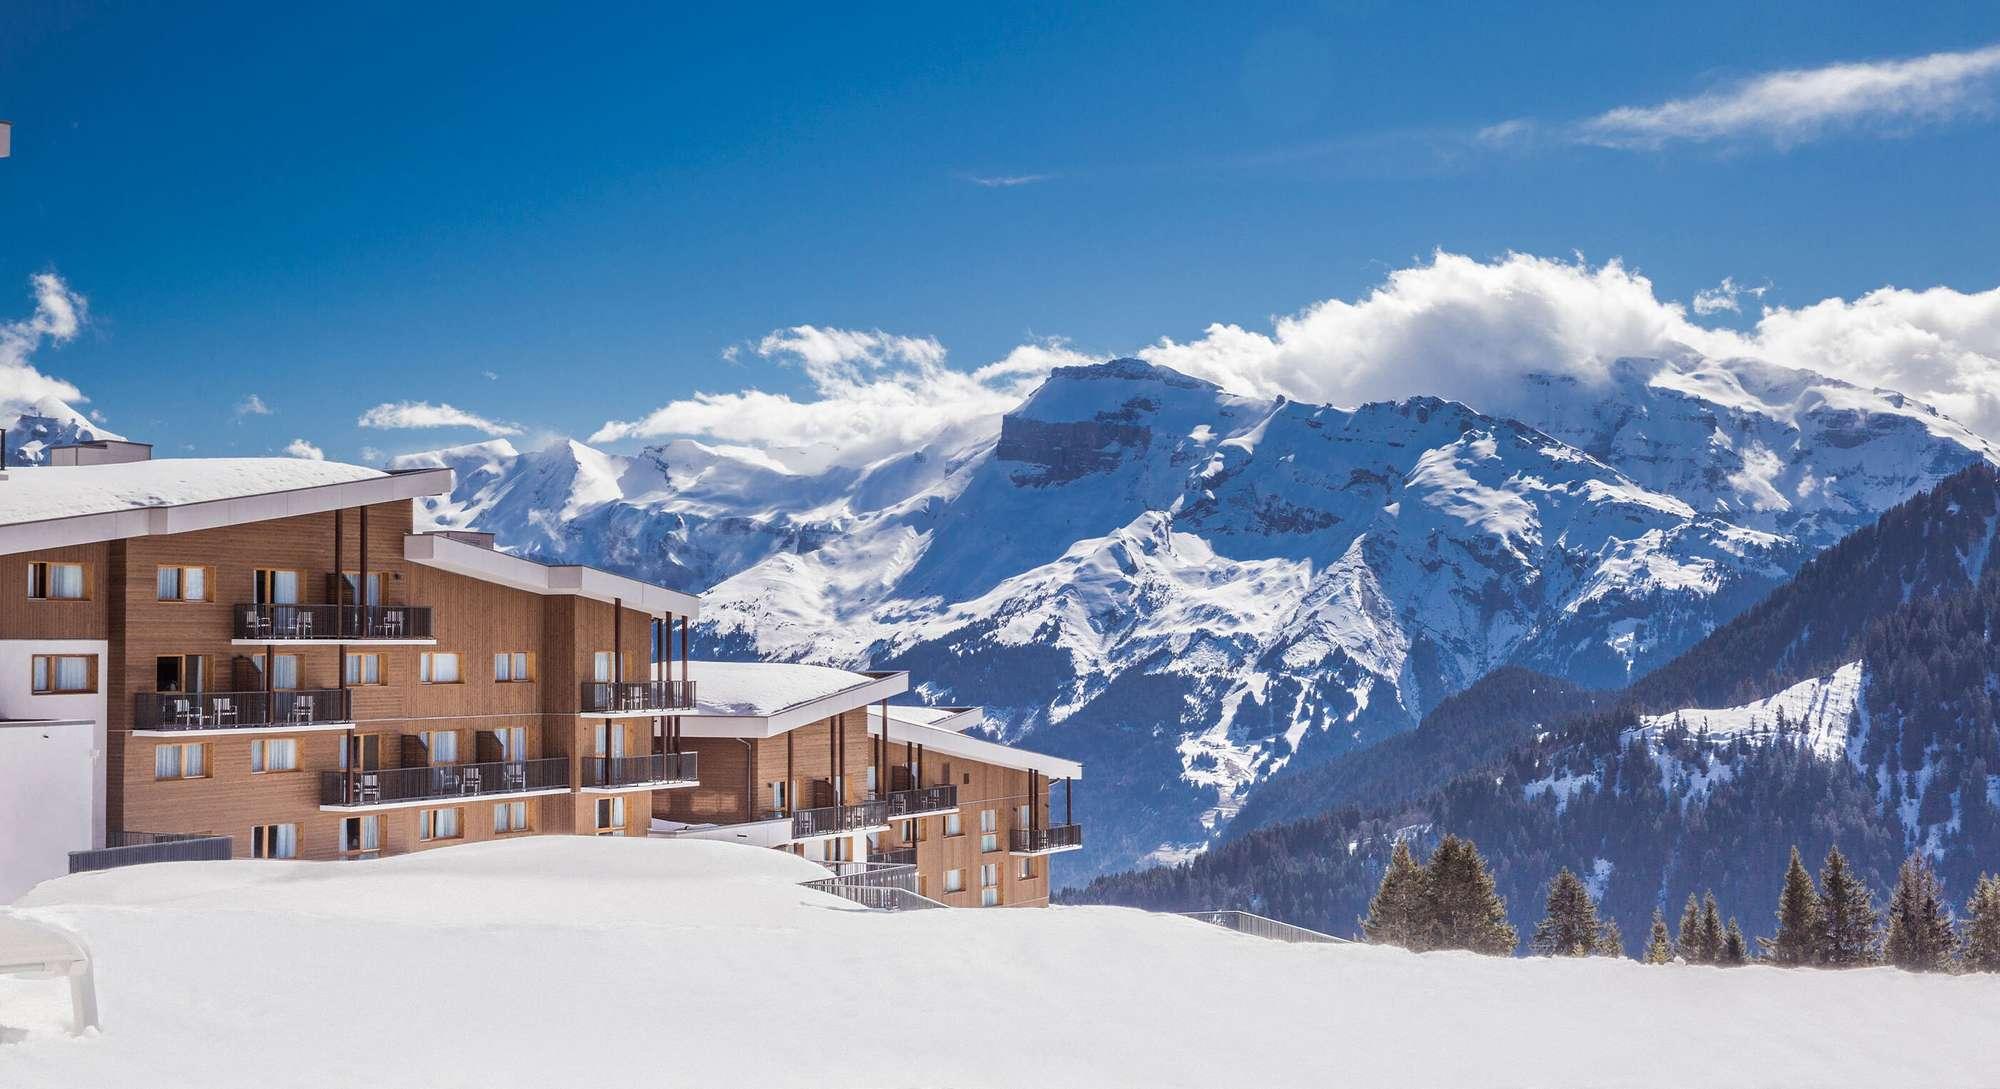 All-Inclusive Snow Resorts